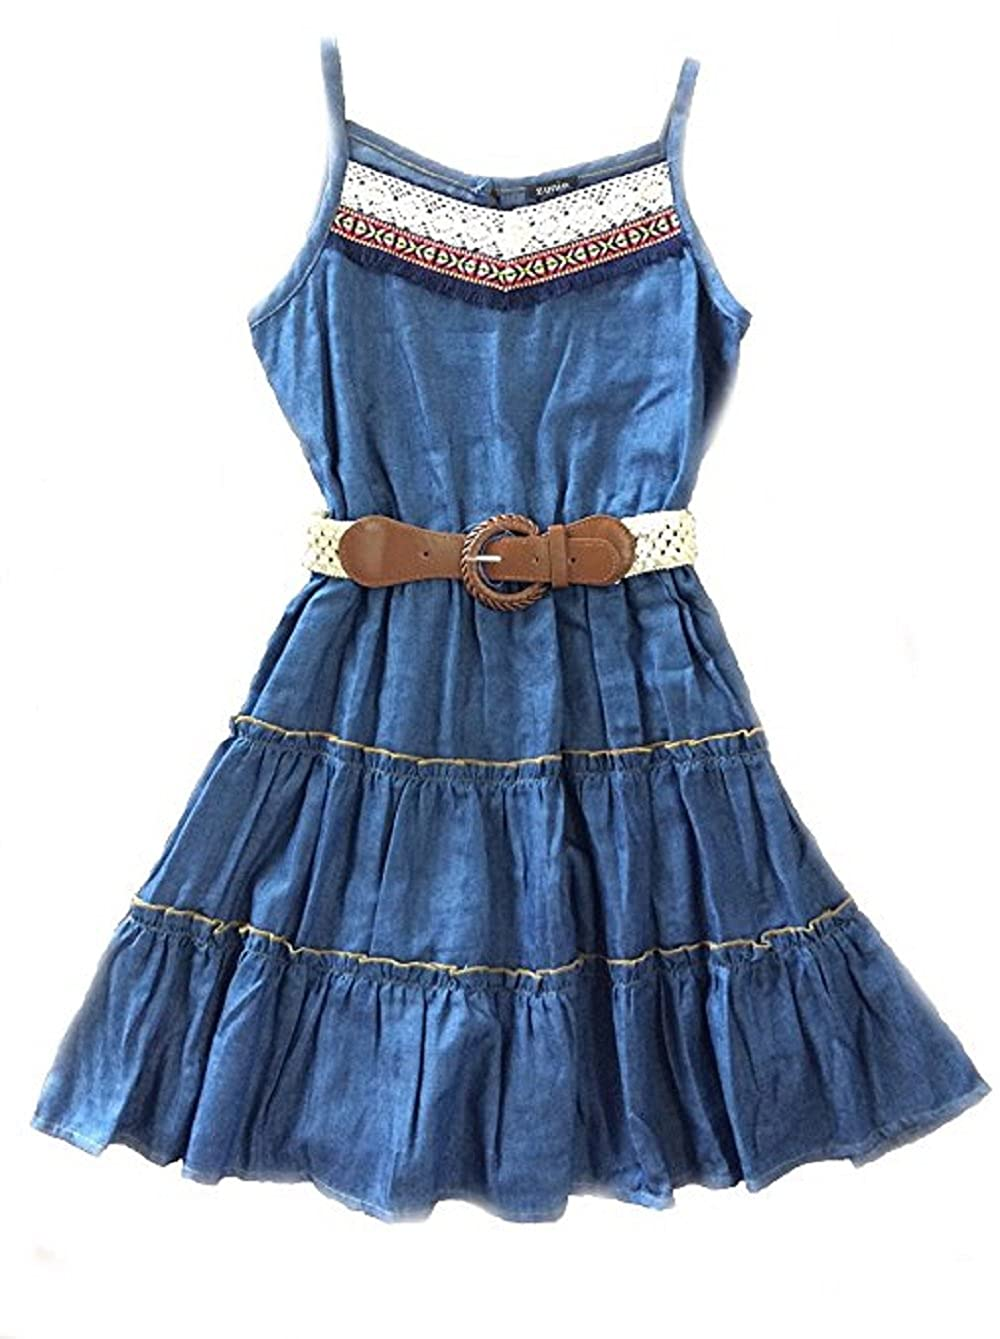 6e54fd74333 Amazon.com  Zunie Big Girls  Denim Shirt Dress with Belt  Clothing